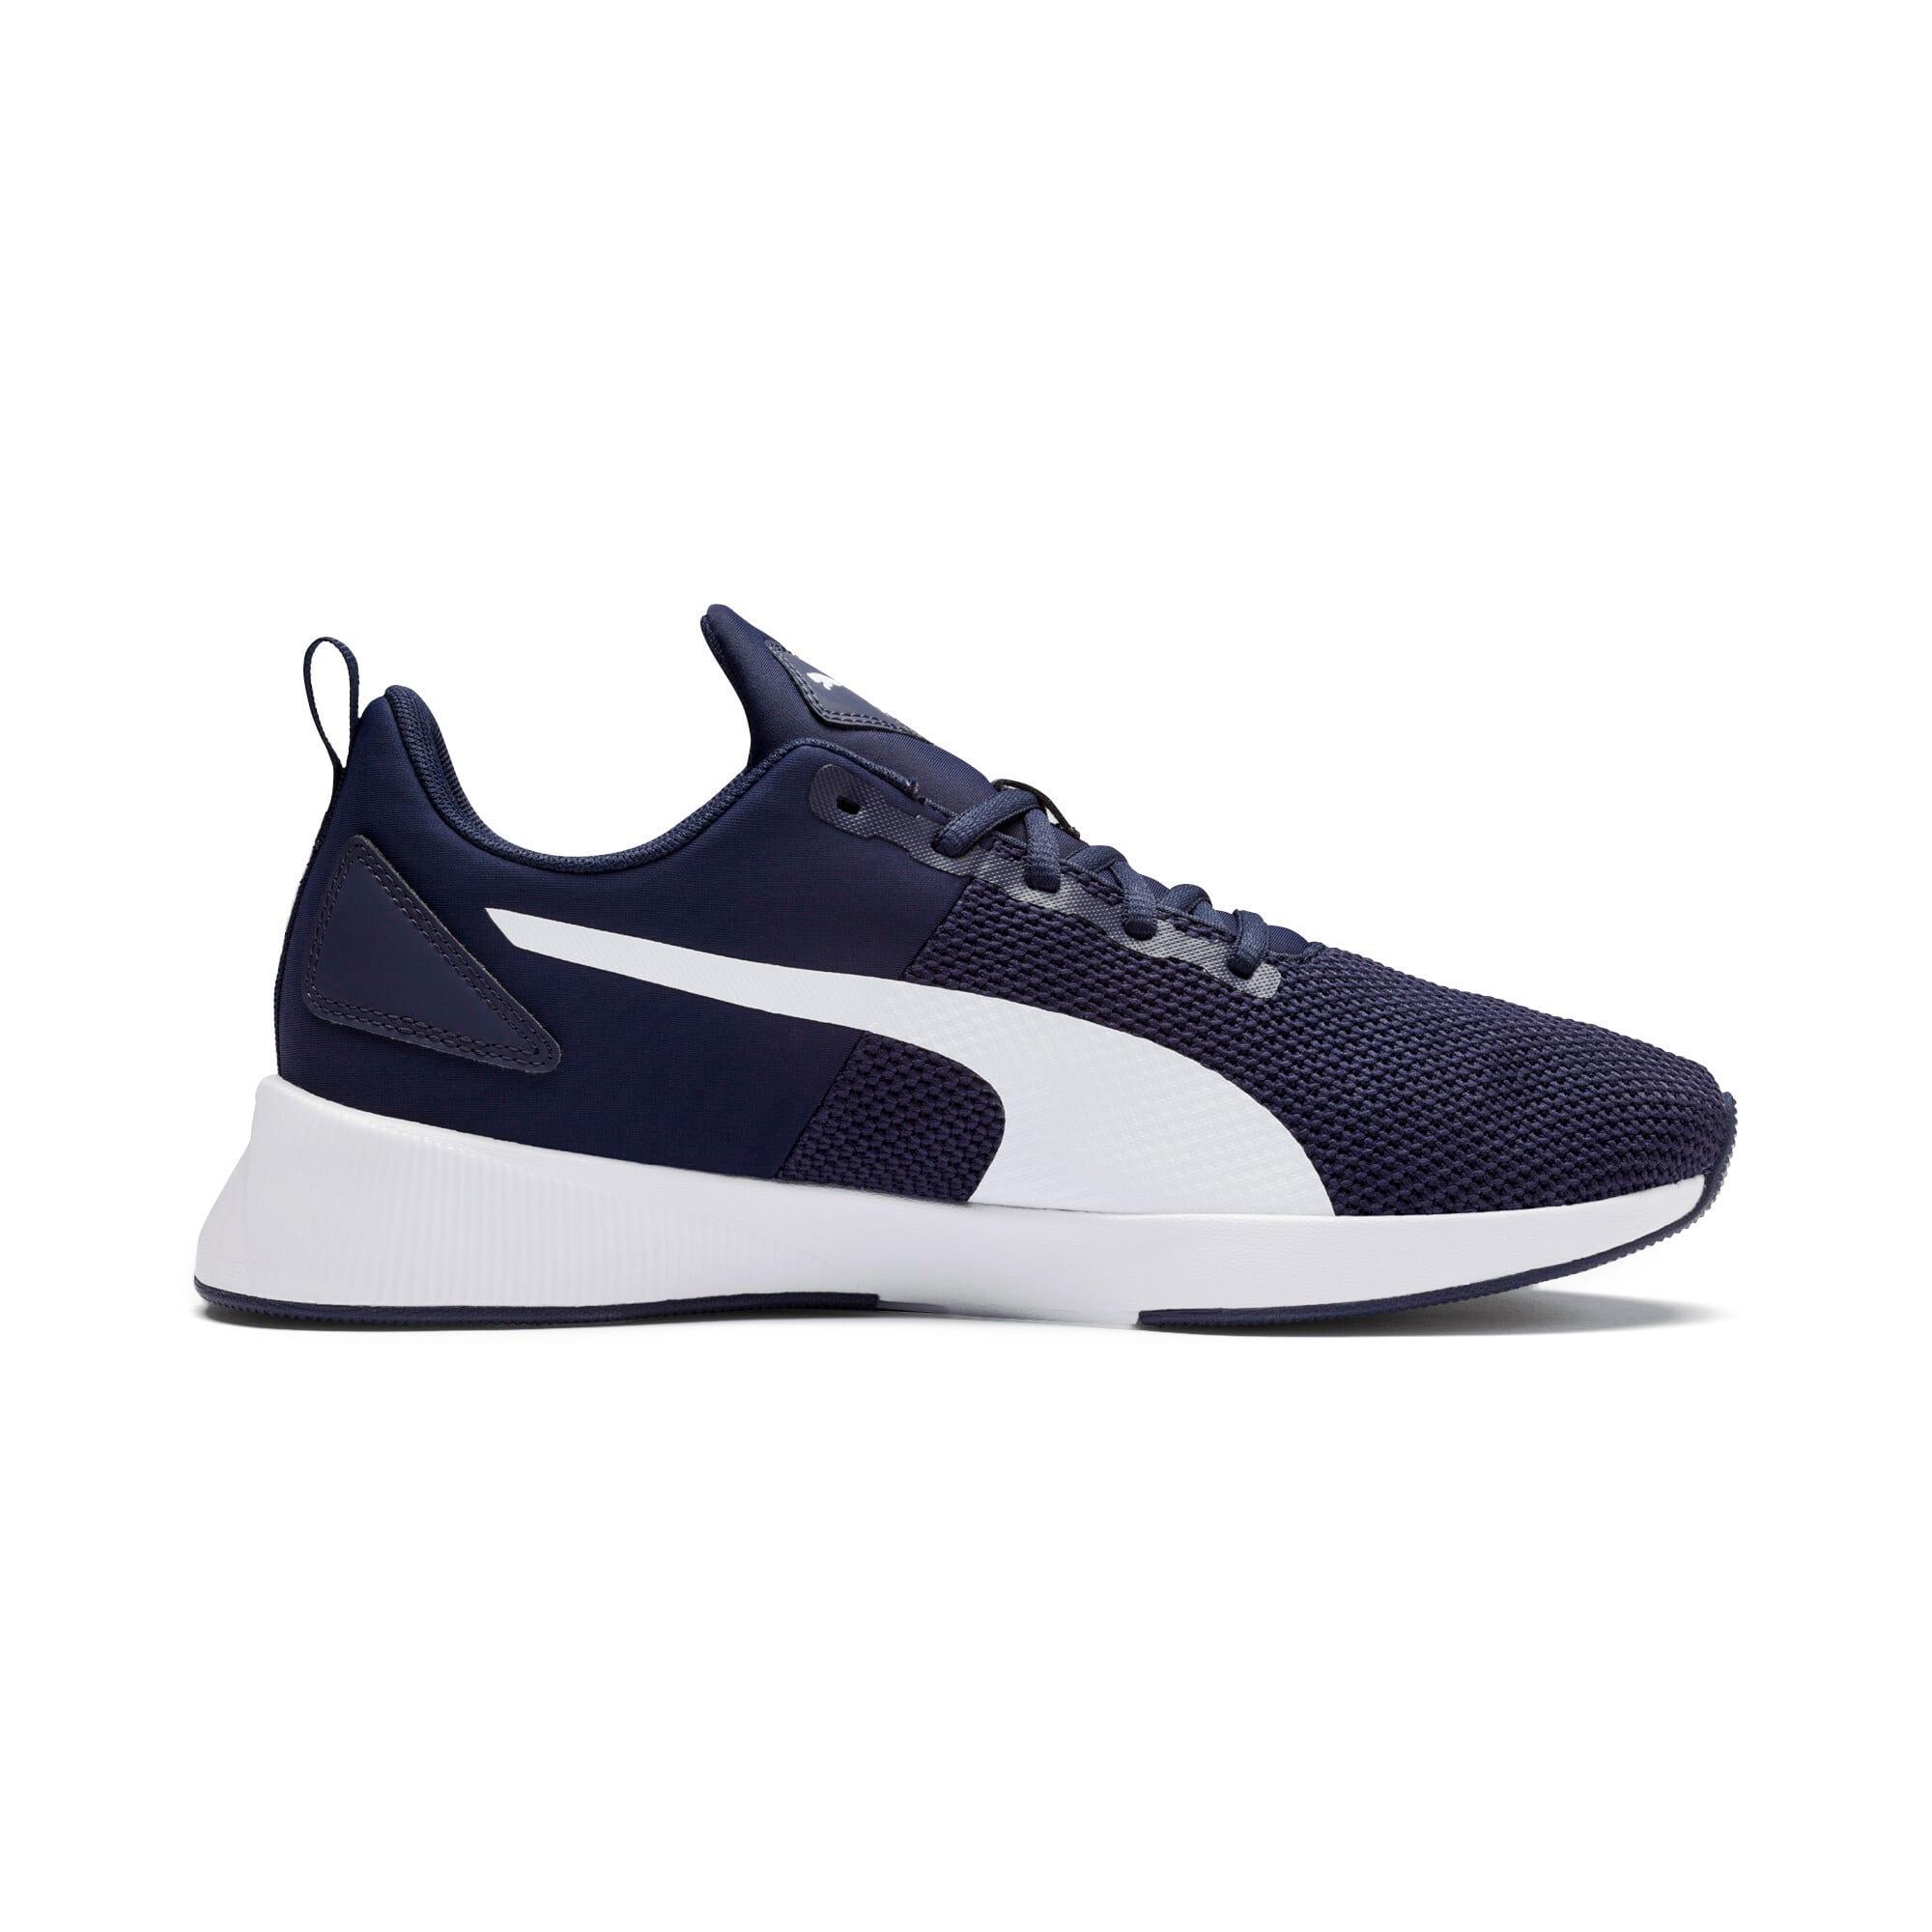 Thumbnail 5 of Flyer Runner Running Shoes, Peacoat-Puma White, medium